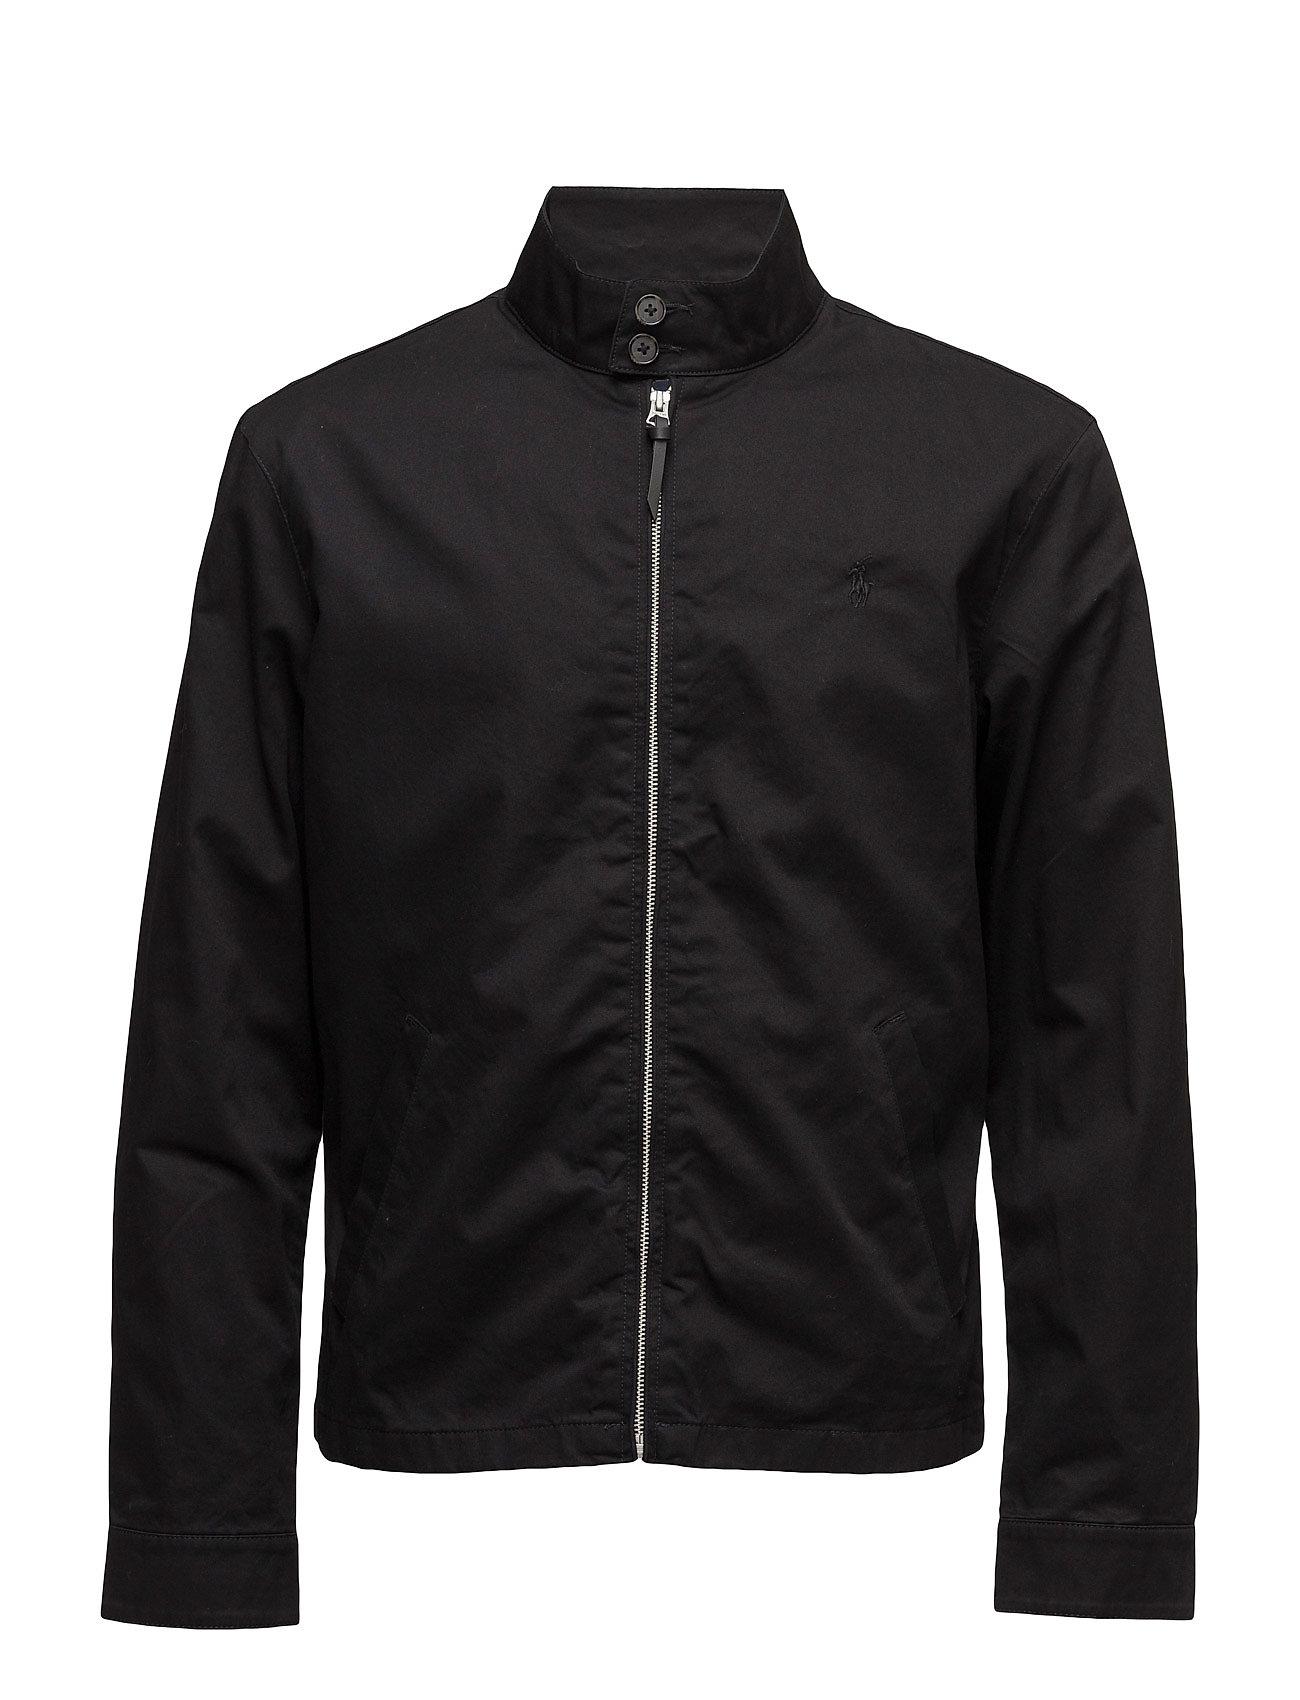 dc16cd47da3f Cotton Twill Jacket (Polo Black) (£78.75) - Polo Ralph Lauren ...